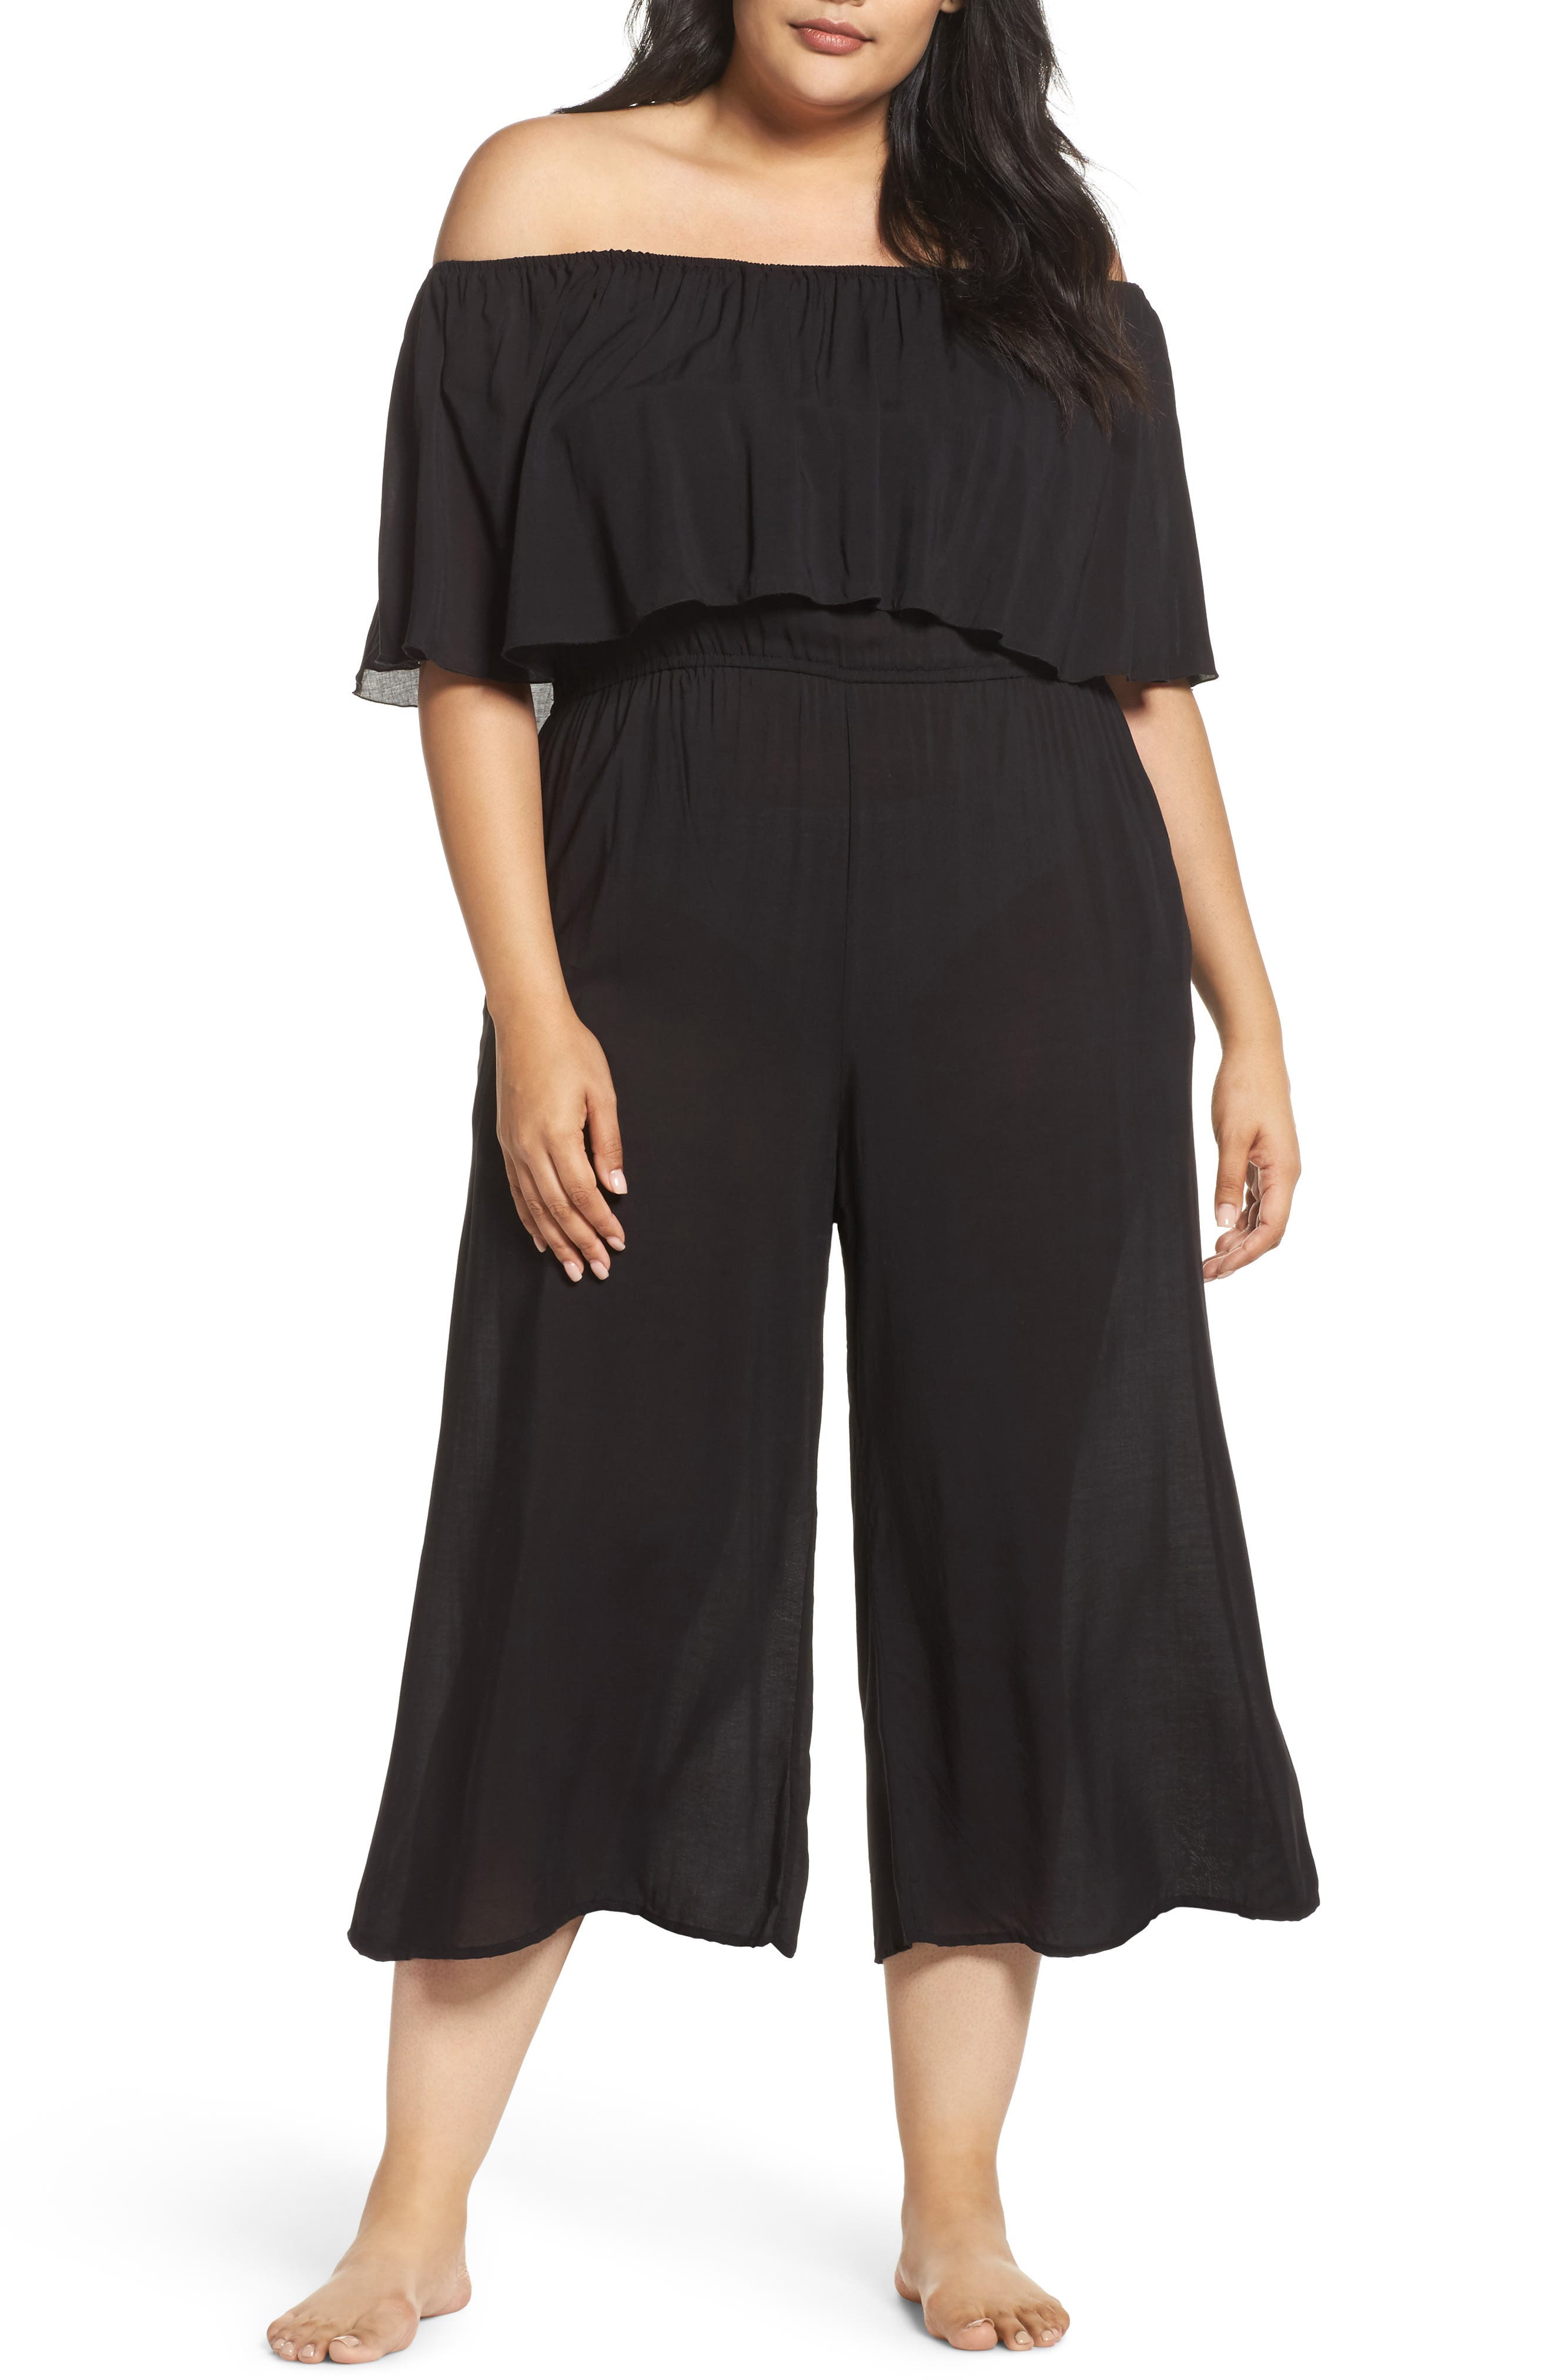 Alternate Image 1 Selected - Elan Off the Shoulder Cover-Up Jumpsuit (Plus Size)